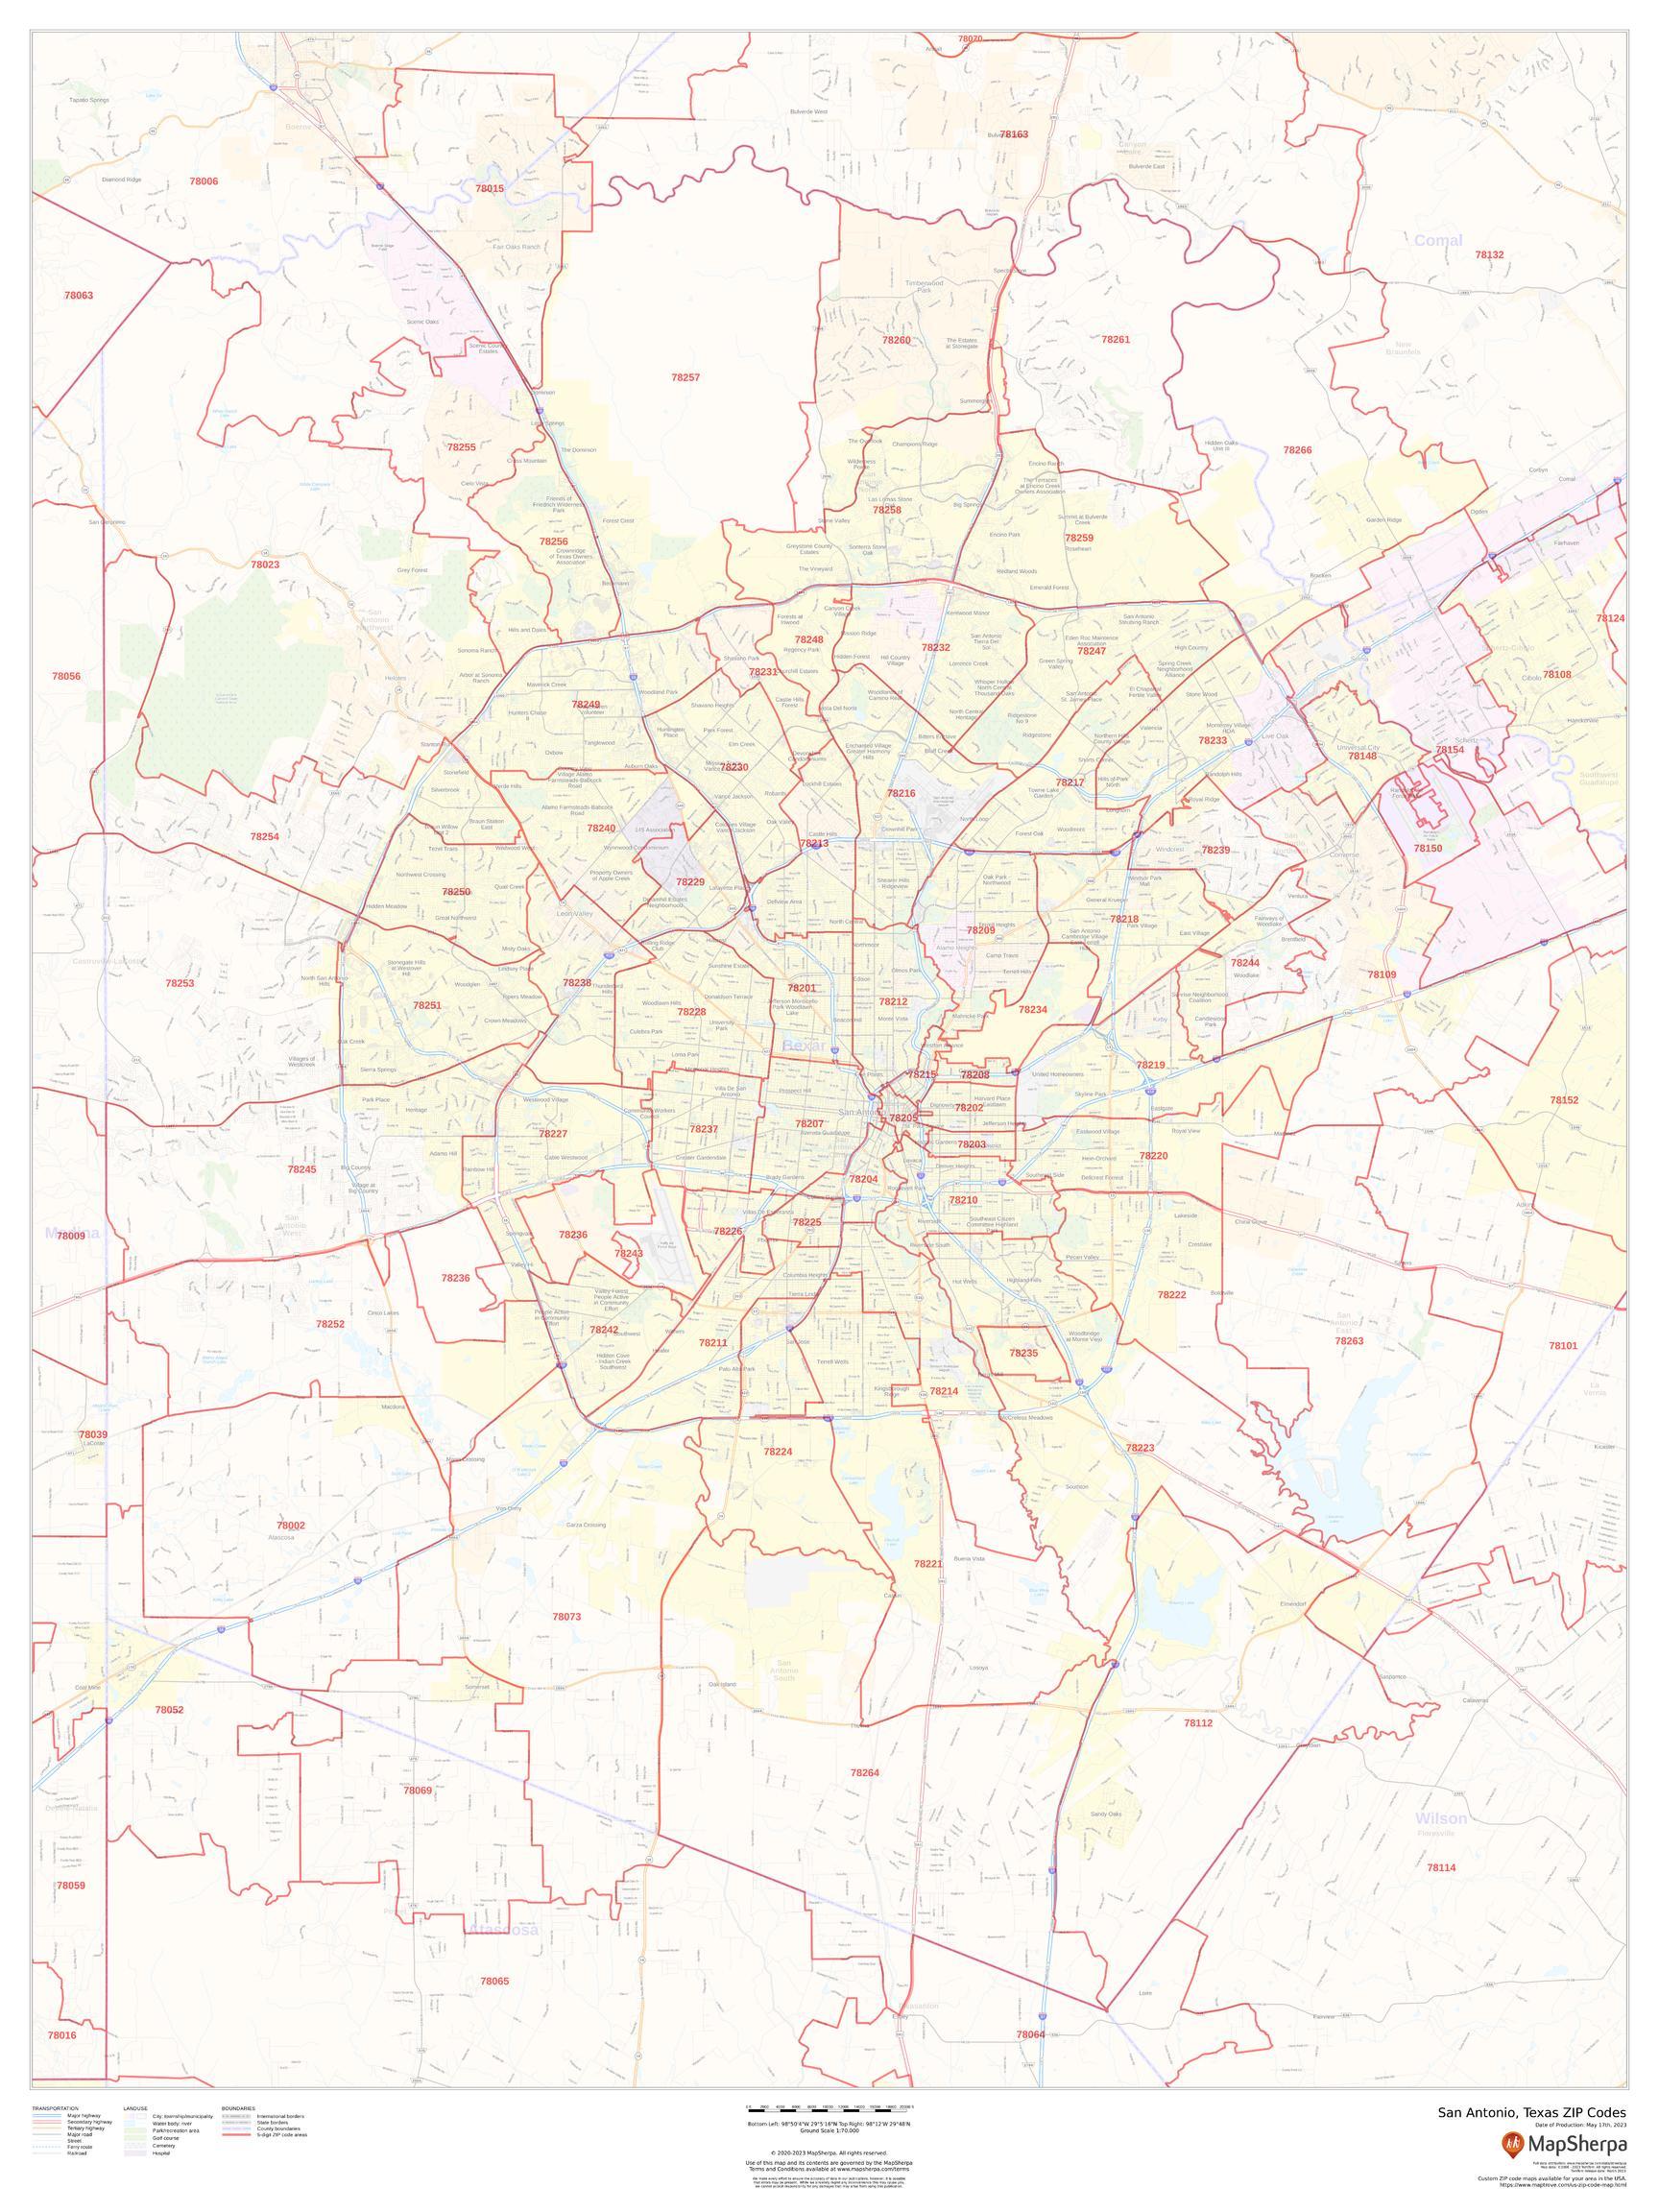 San Antonio, Texas ZIP Codes